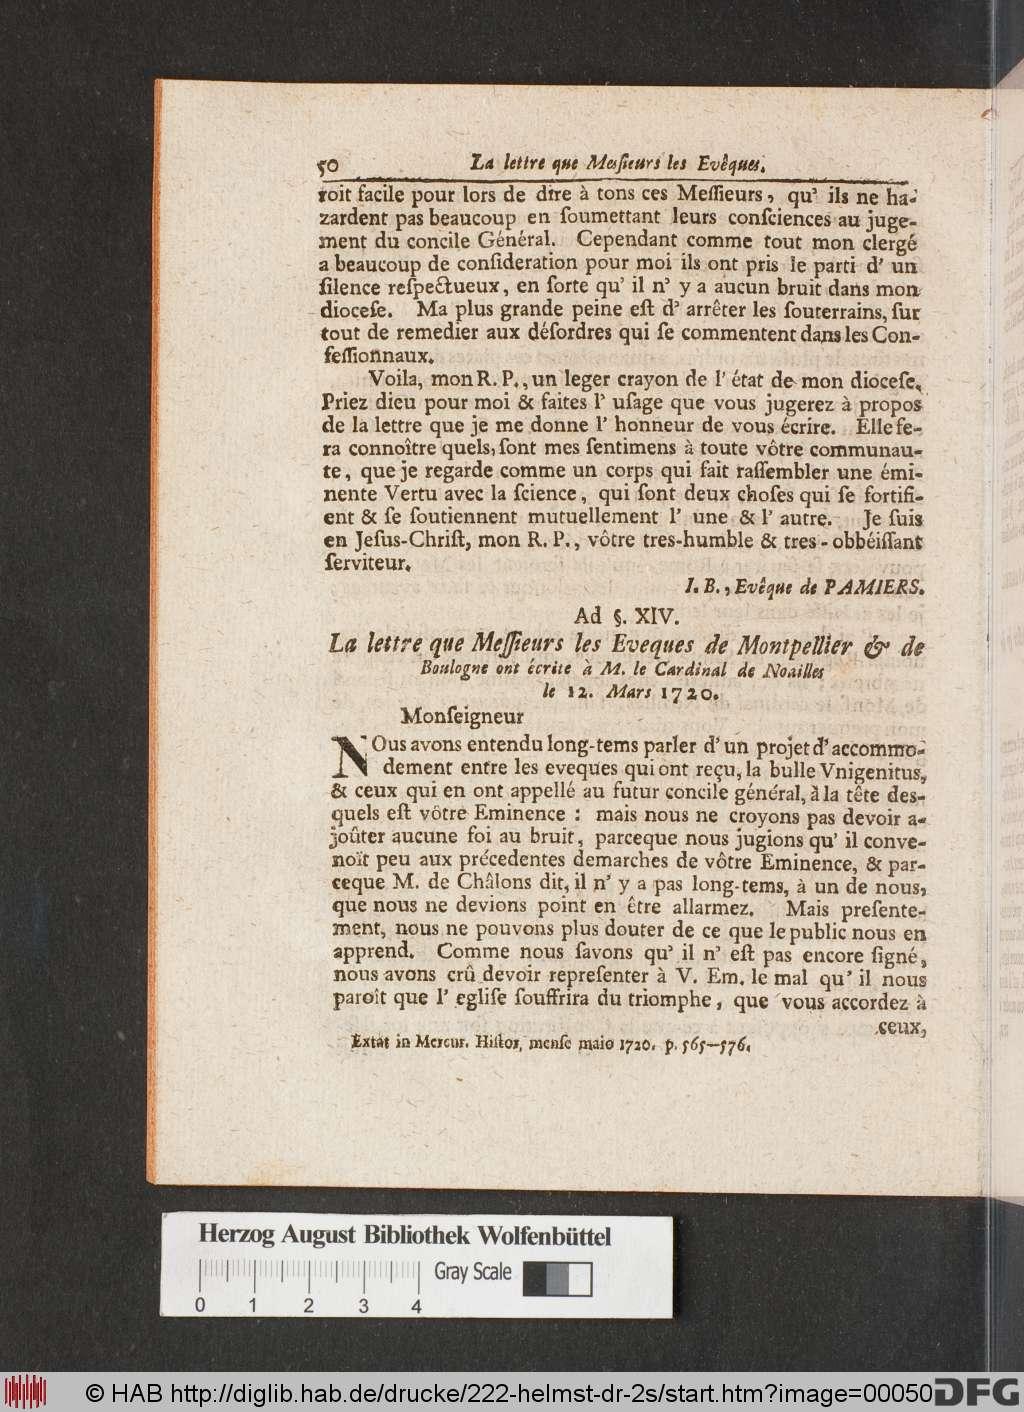 http://diglib.hab.de/drucke/222-helmst-dr-2s/00050.jpg